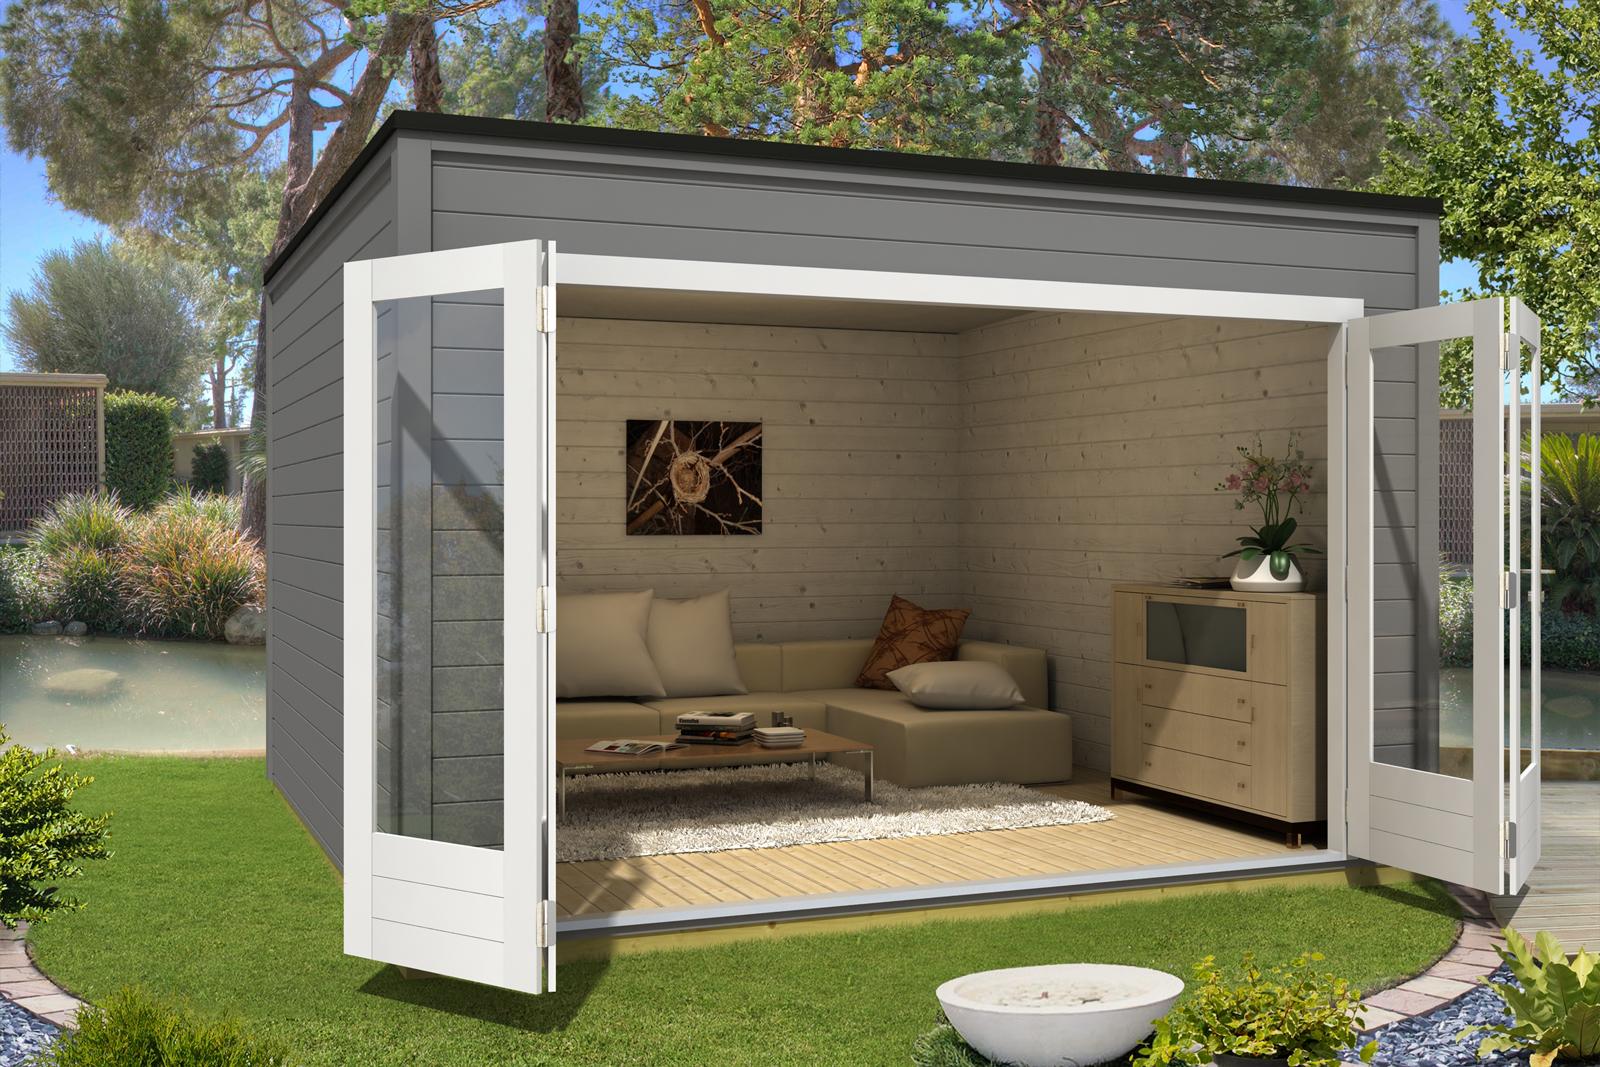 design gartenhaus cubus olymp 44 iso. Black Bedroom Furniture Sets. Home Design Ideas